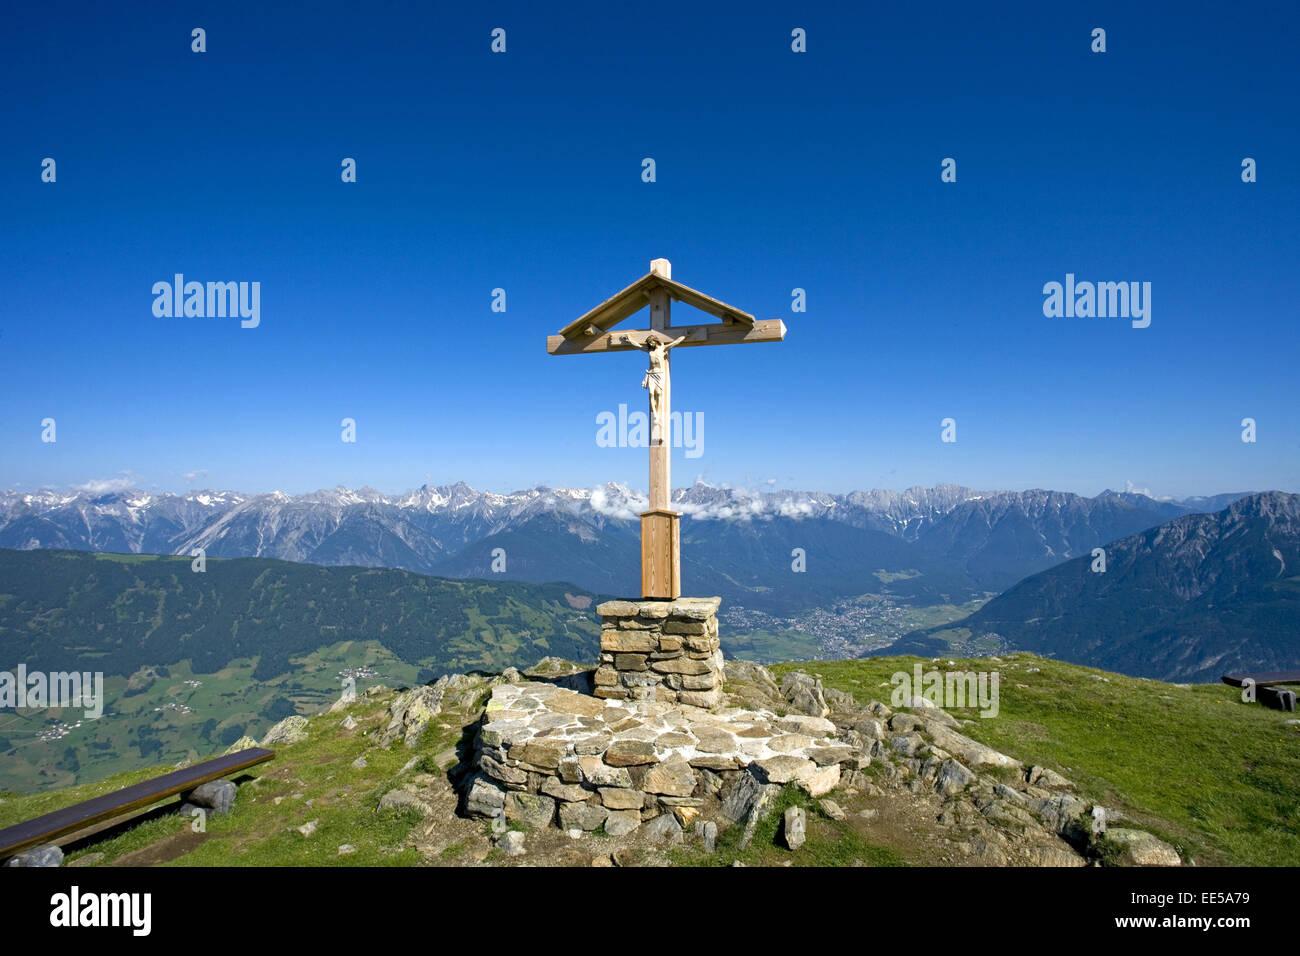 Bildausschnitt, Christus, Detail, Details, Gipfel, Gipfelkreuz, Gipfelkreuze, Glaube, Holz, Jesus, Kreuz, Kreuze, - Stock Image